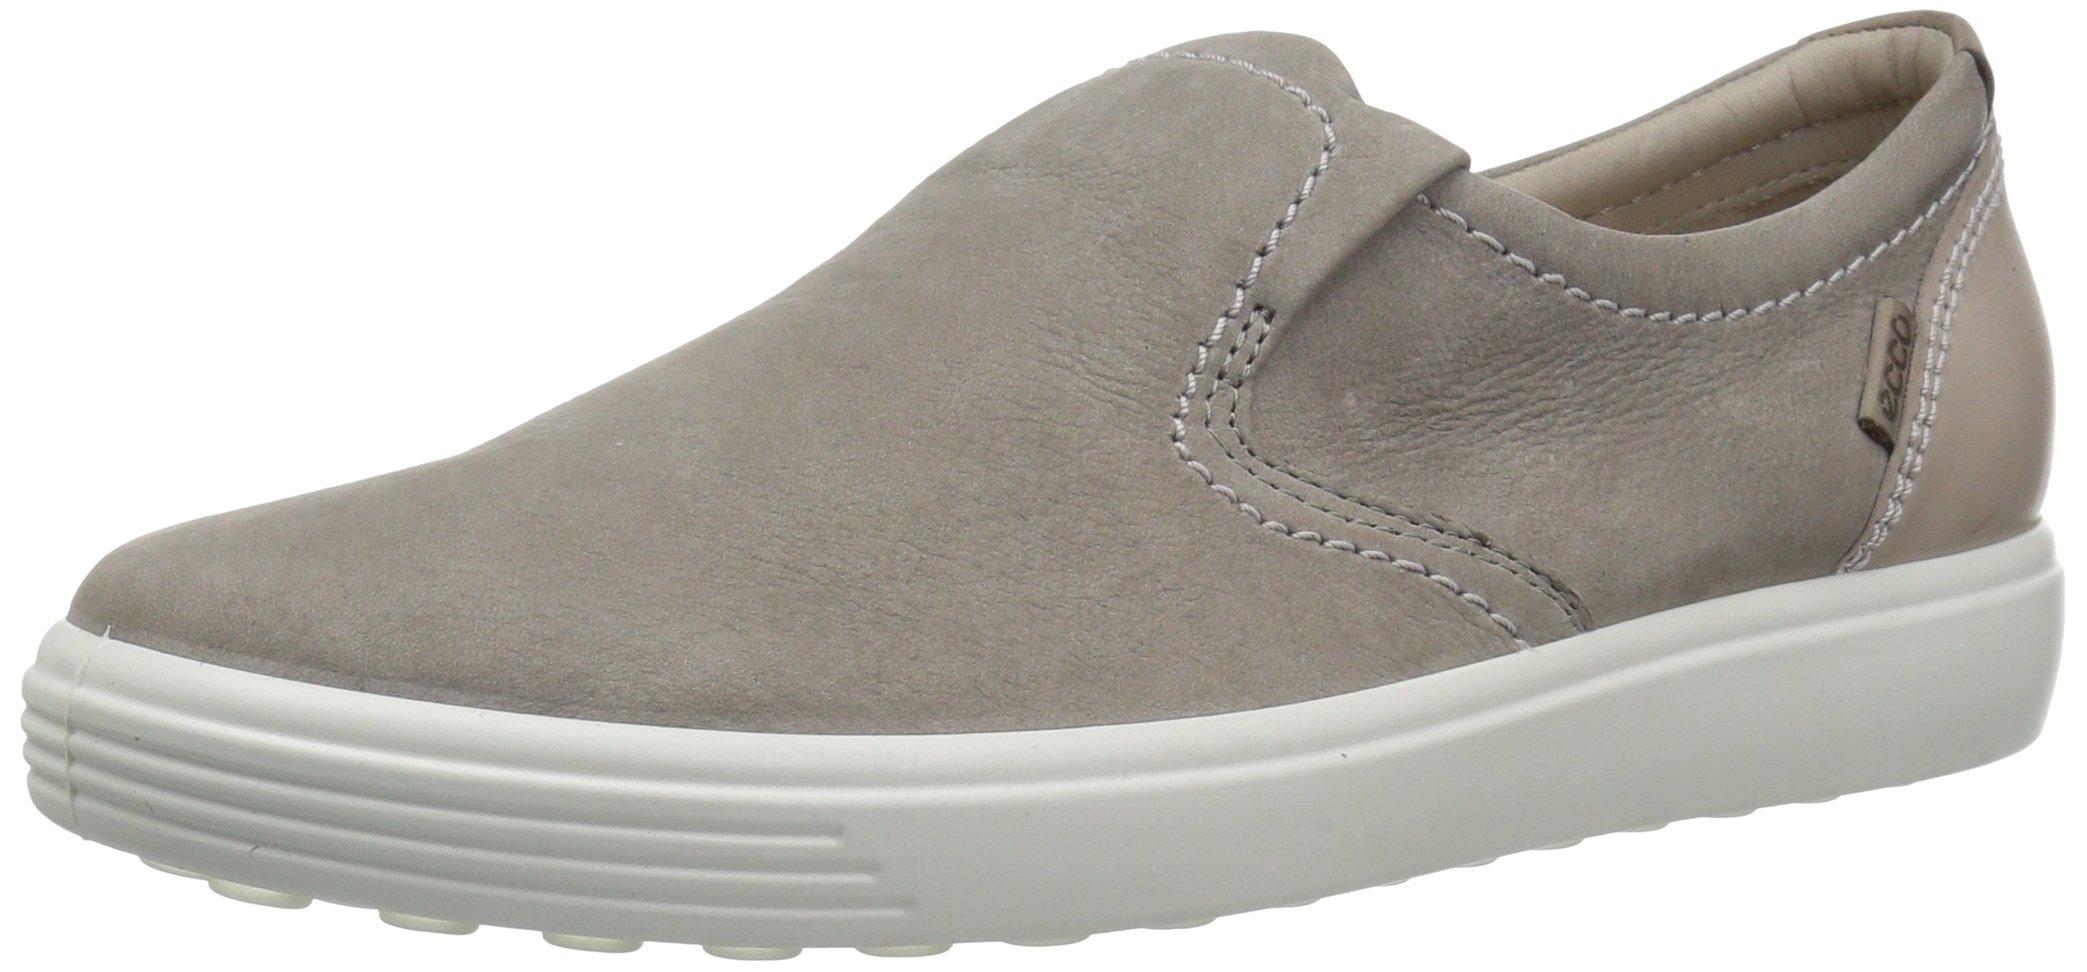 ECCO Women's Soft 7 Slip Fashion Sneaker, Warm Grey Woven, 37 EU/6-6.5 M US